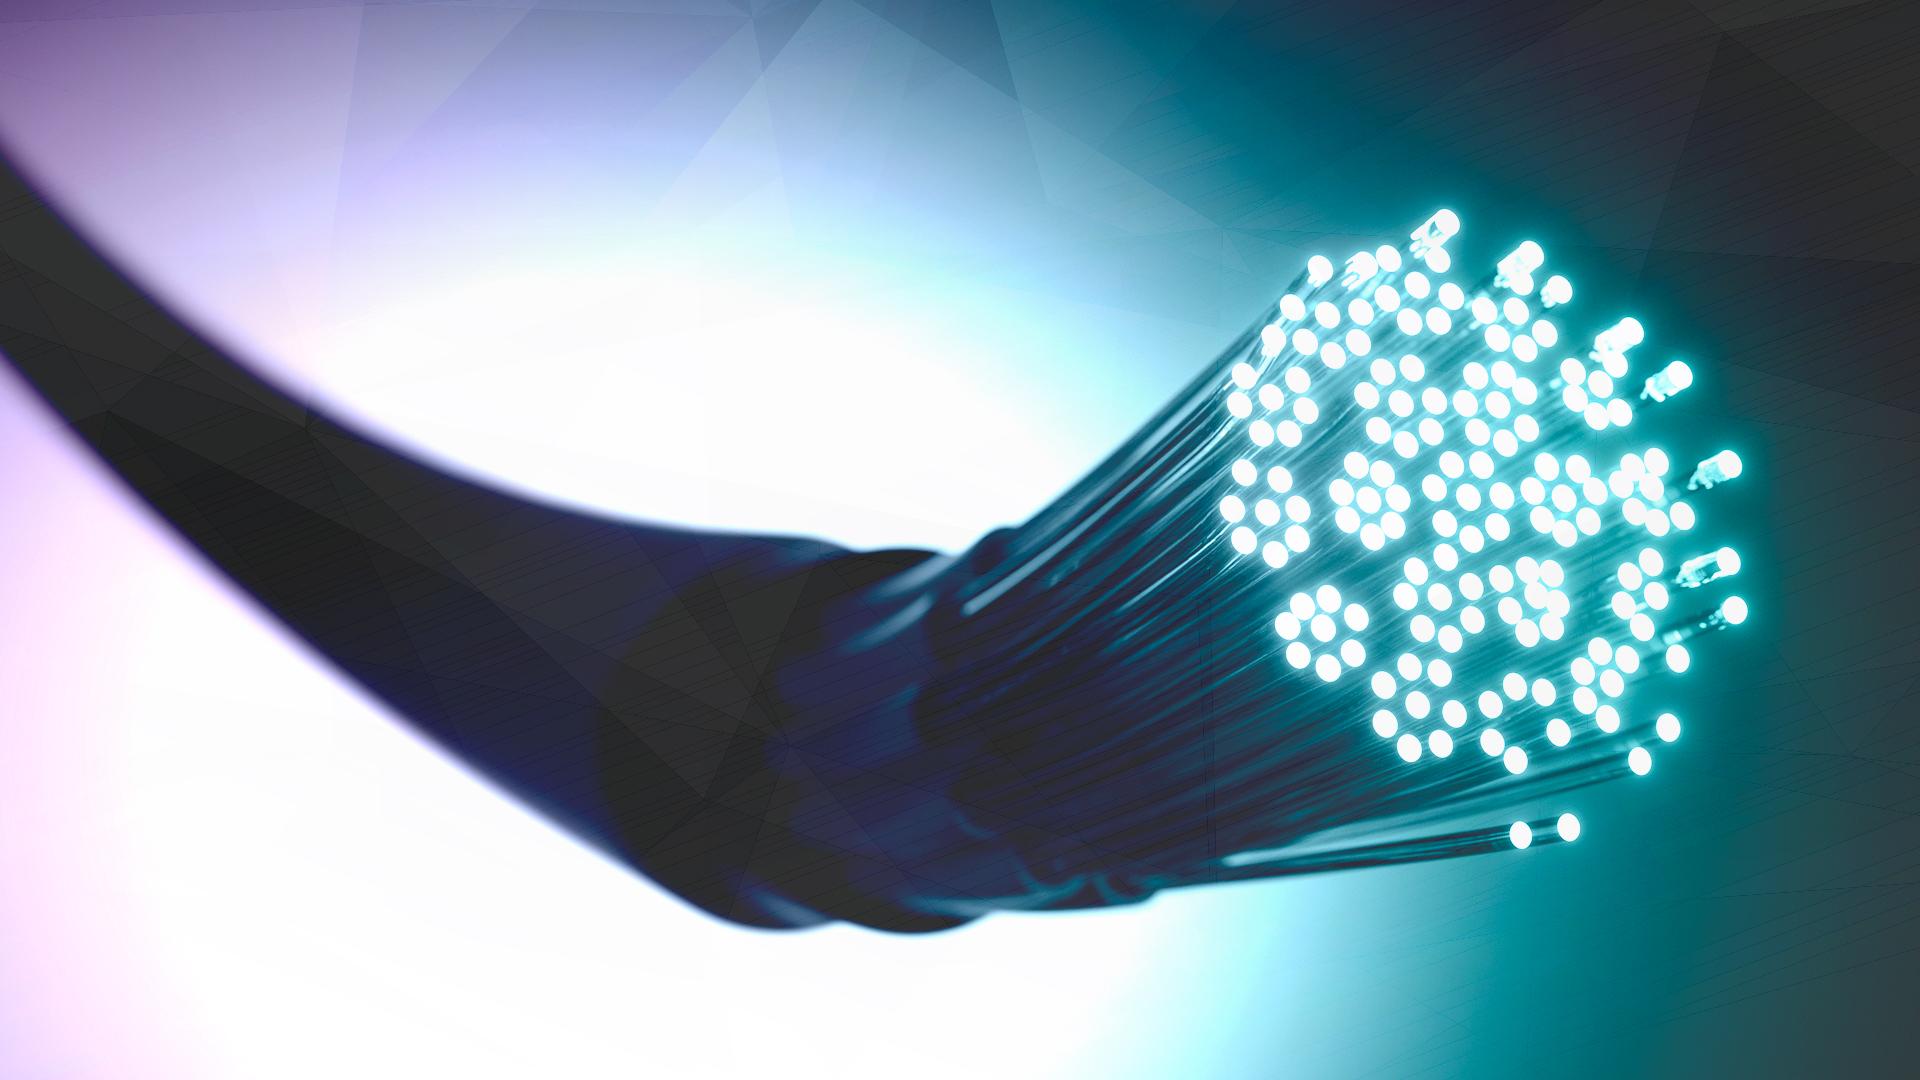 Breitband, Netzausbau, Dsl, Glasfaser, Kabel, Kabelnetz, Breitband Ausbau, Fiber, Breitbandausbau, Breitband Abdeckung, Glasfasernetz, Glasfasern, Glasfaser Netz